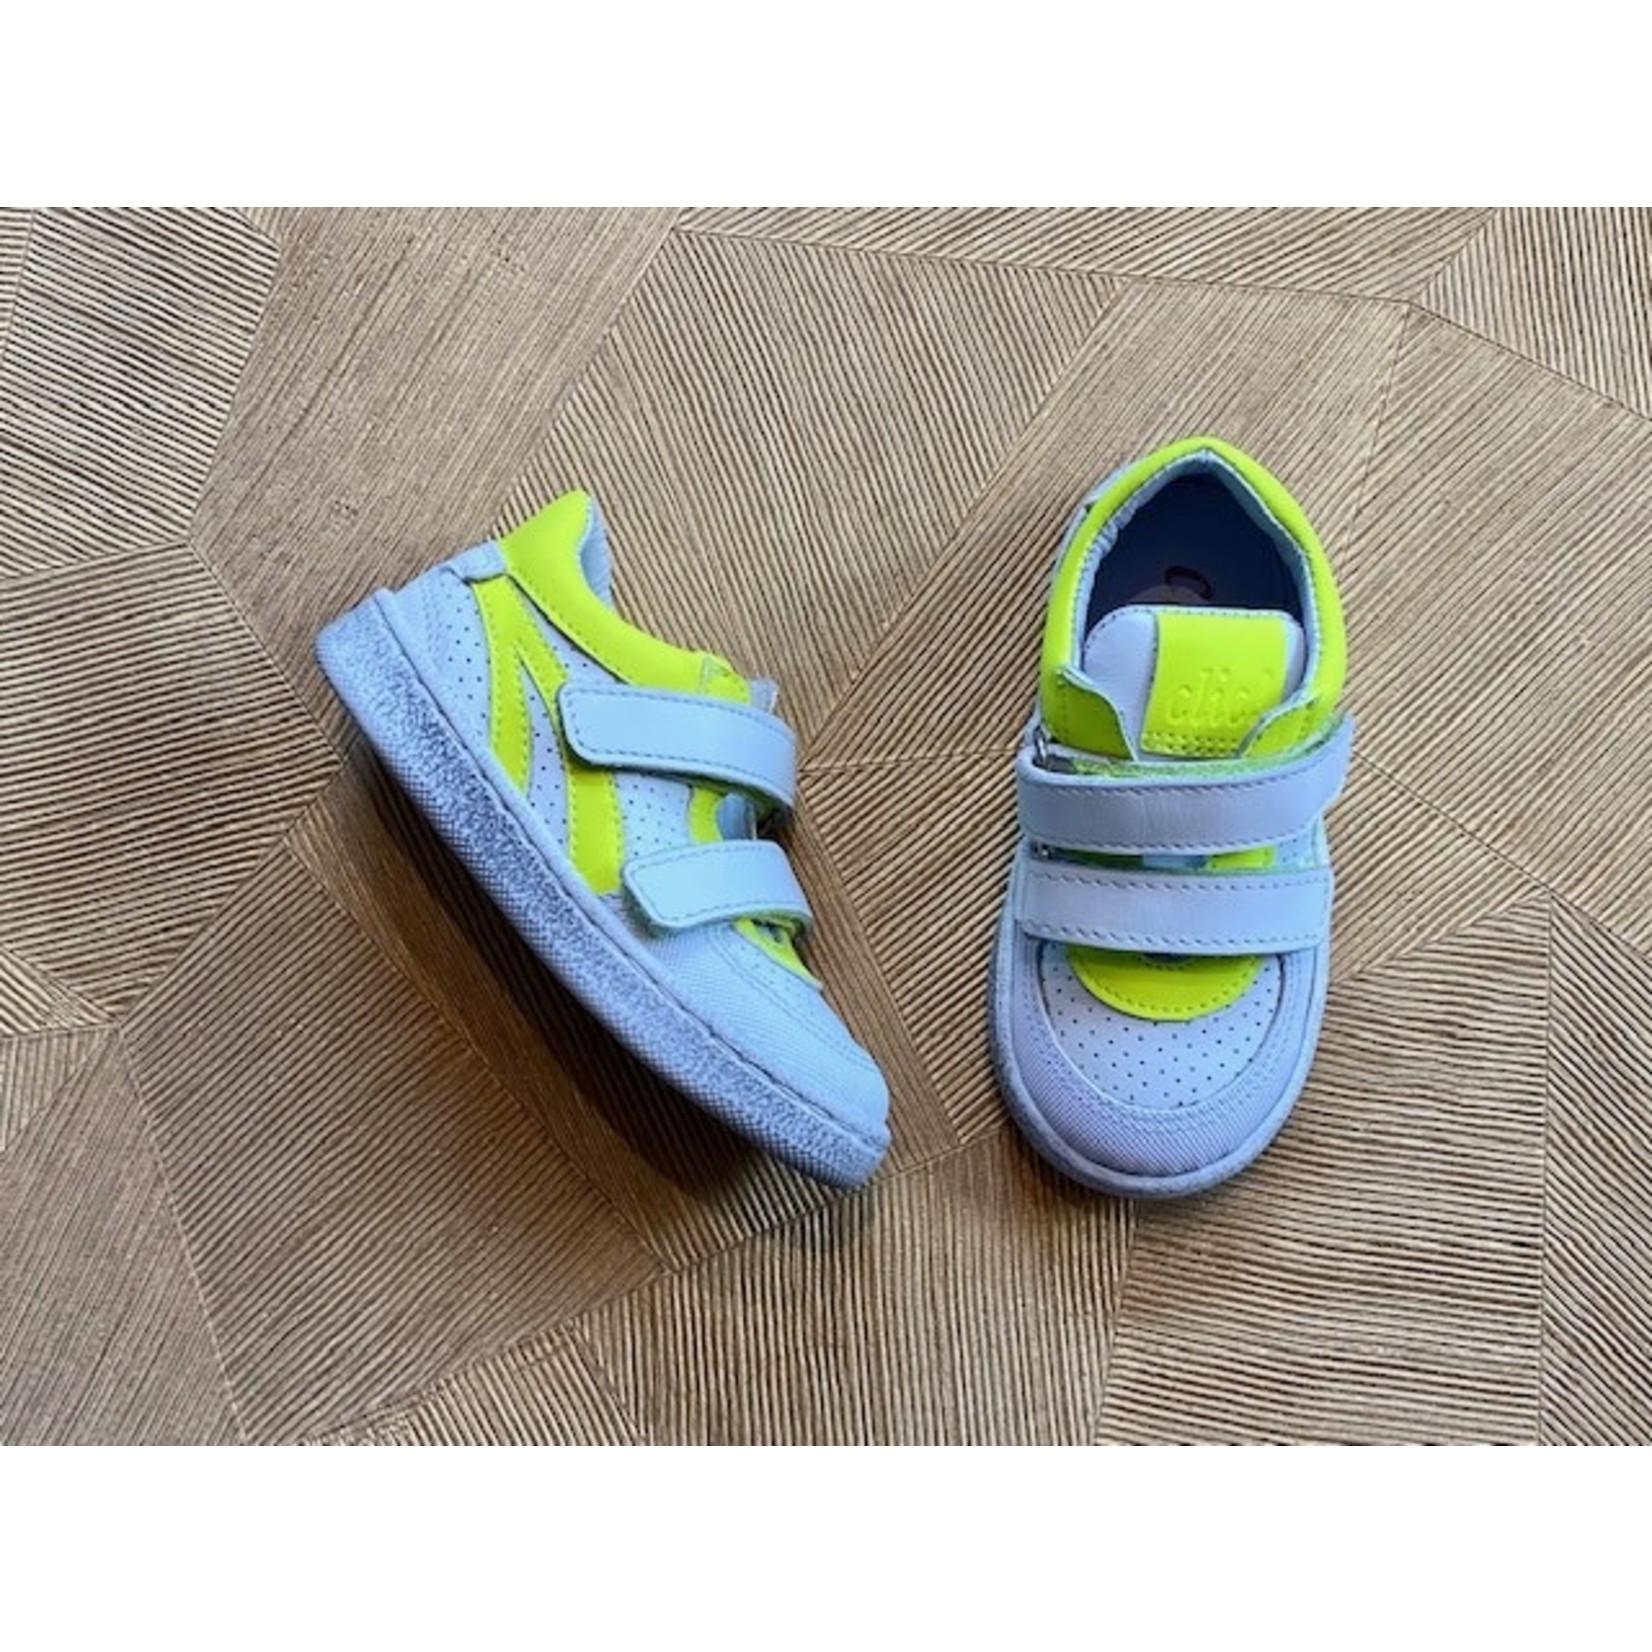 CLIC CLIC * flex klittenband wit+fluor  geel